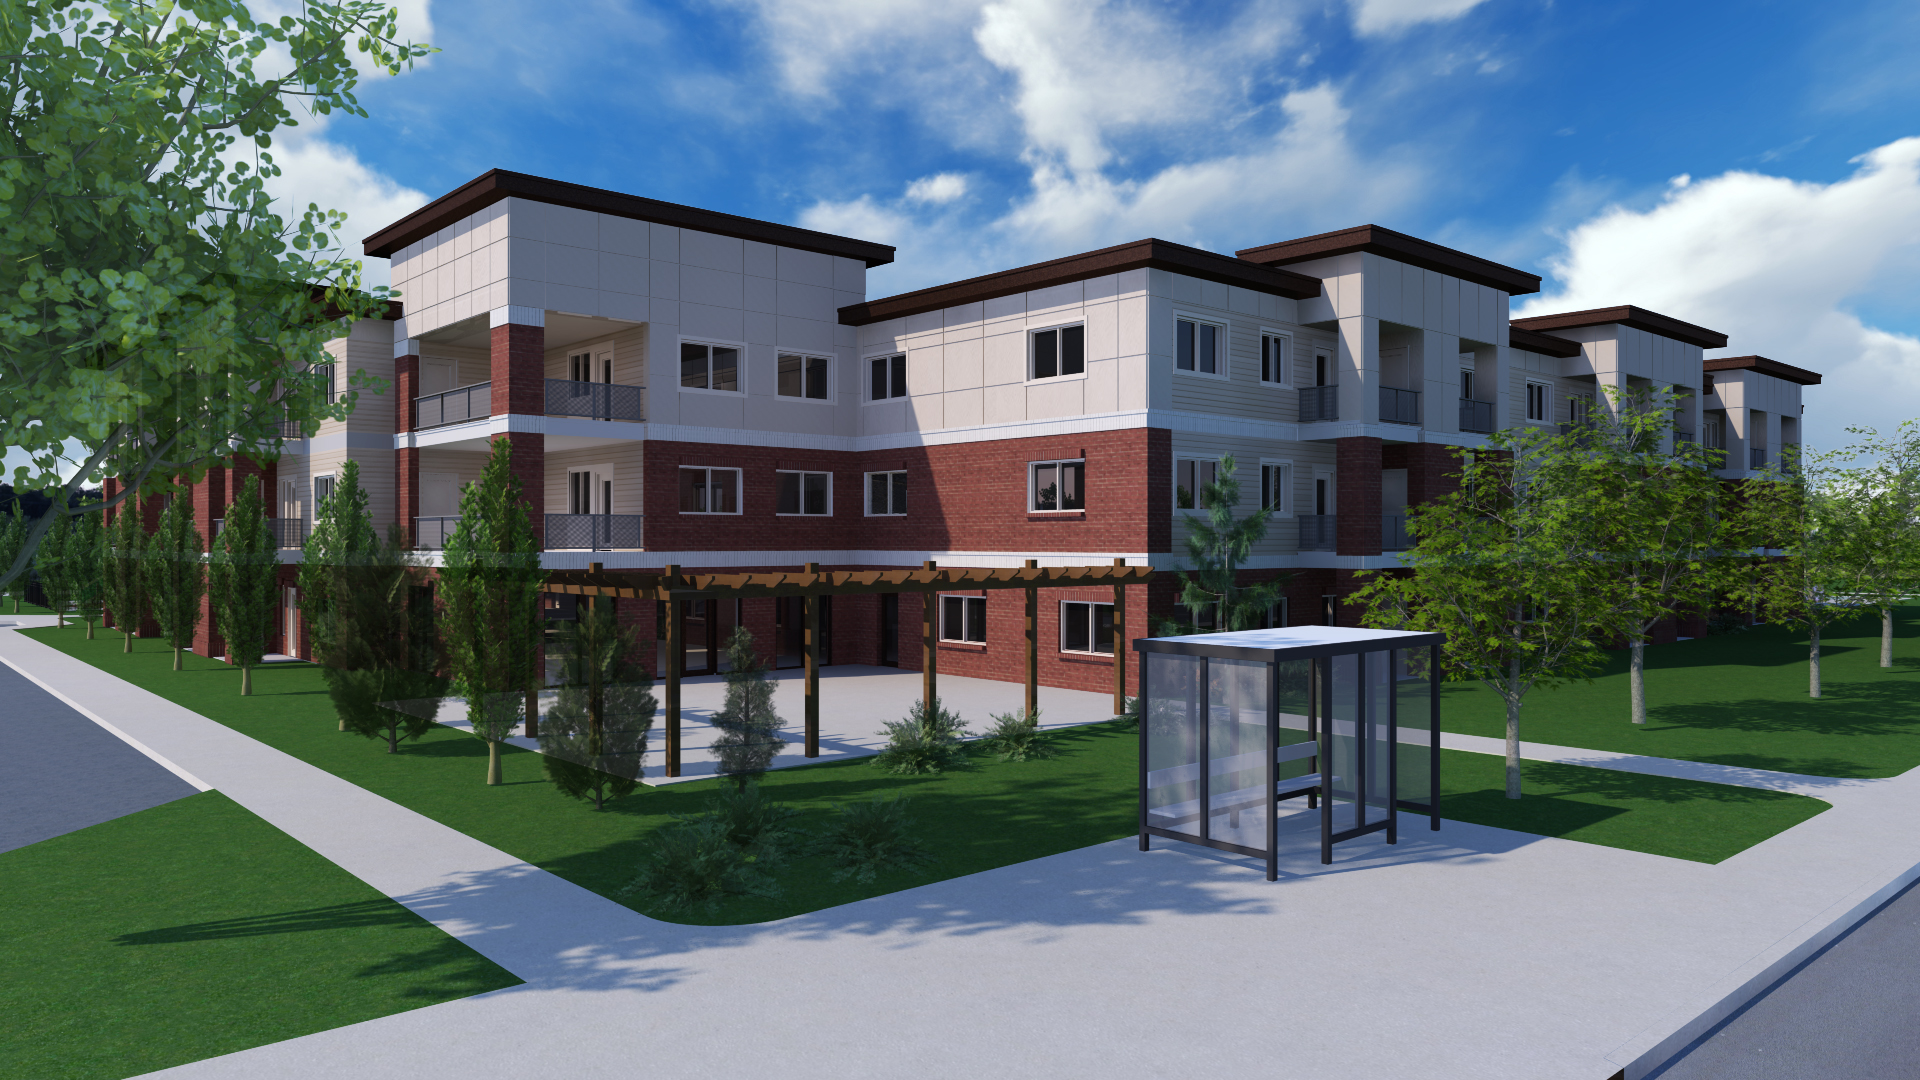 Image of Mercy Creek Apartments in Nampa, Idaho